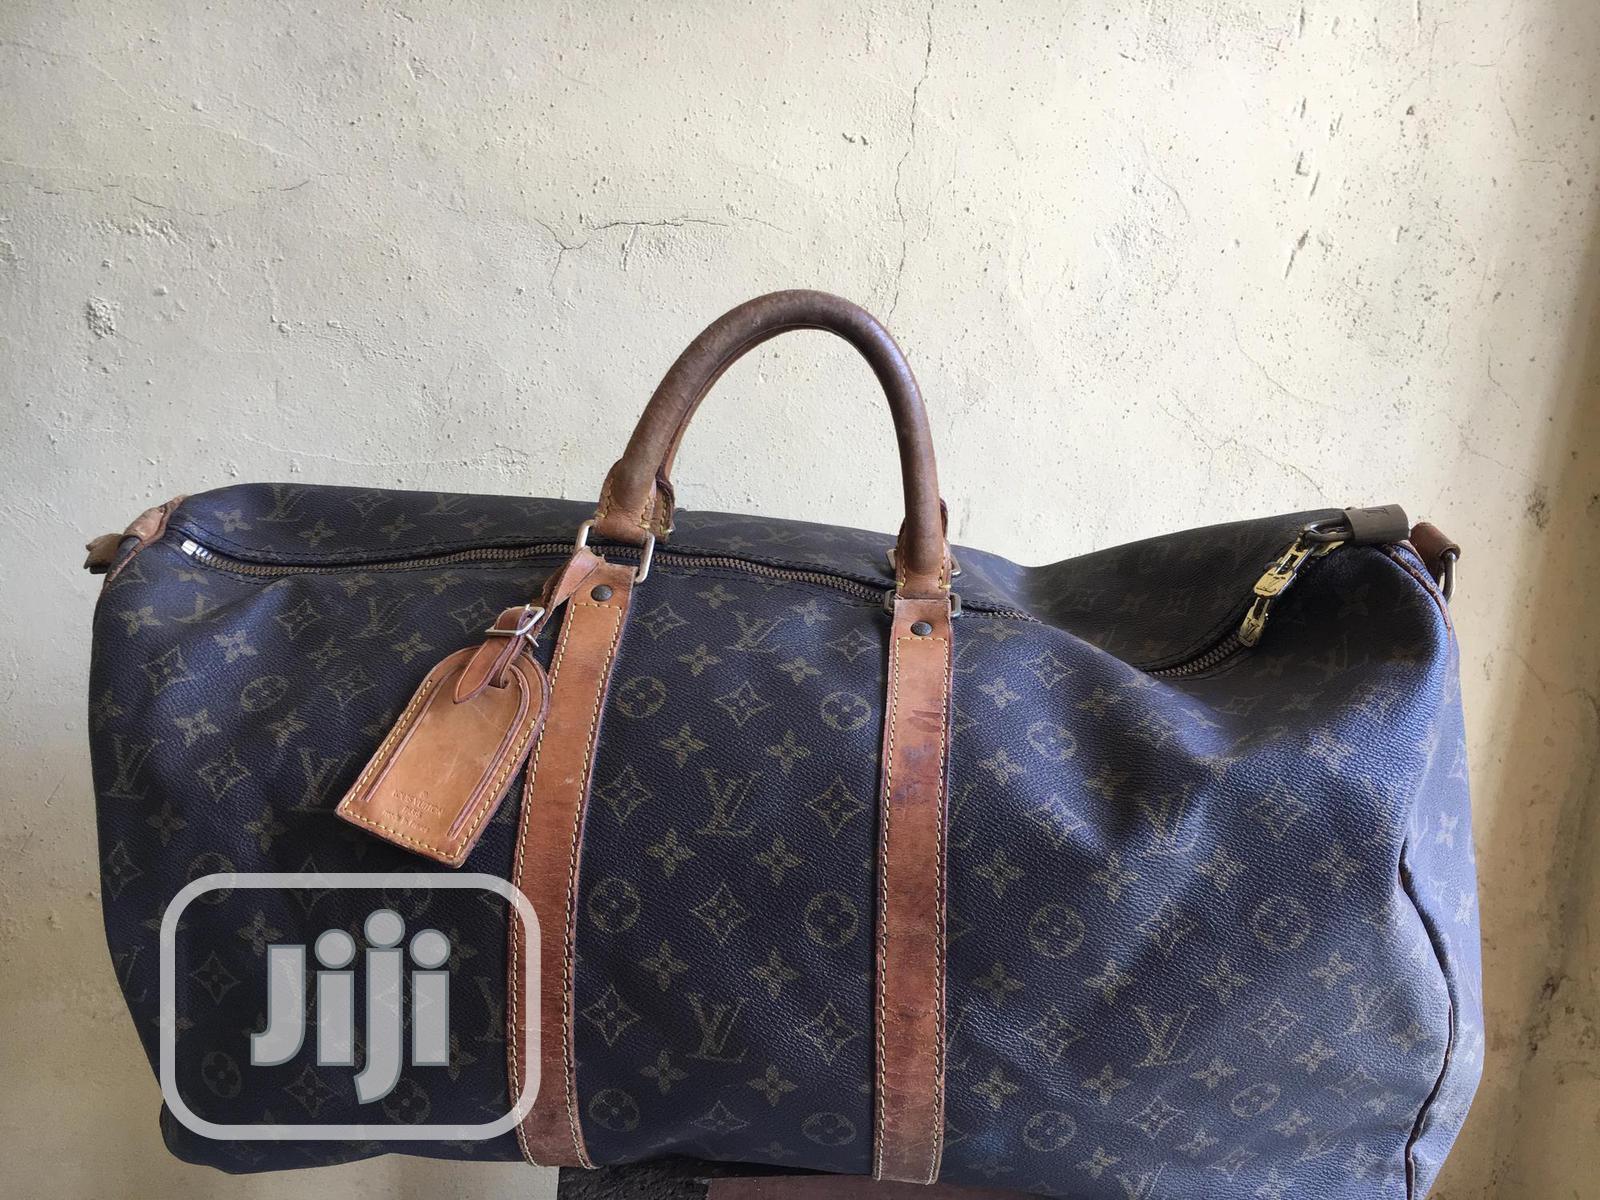 Original Louis Vuitton Duffel Bag (Italian Leather )